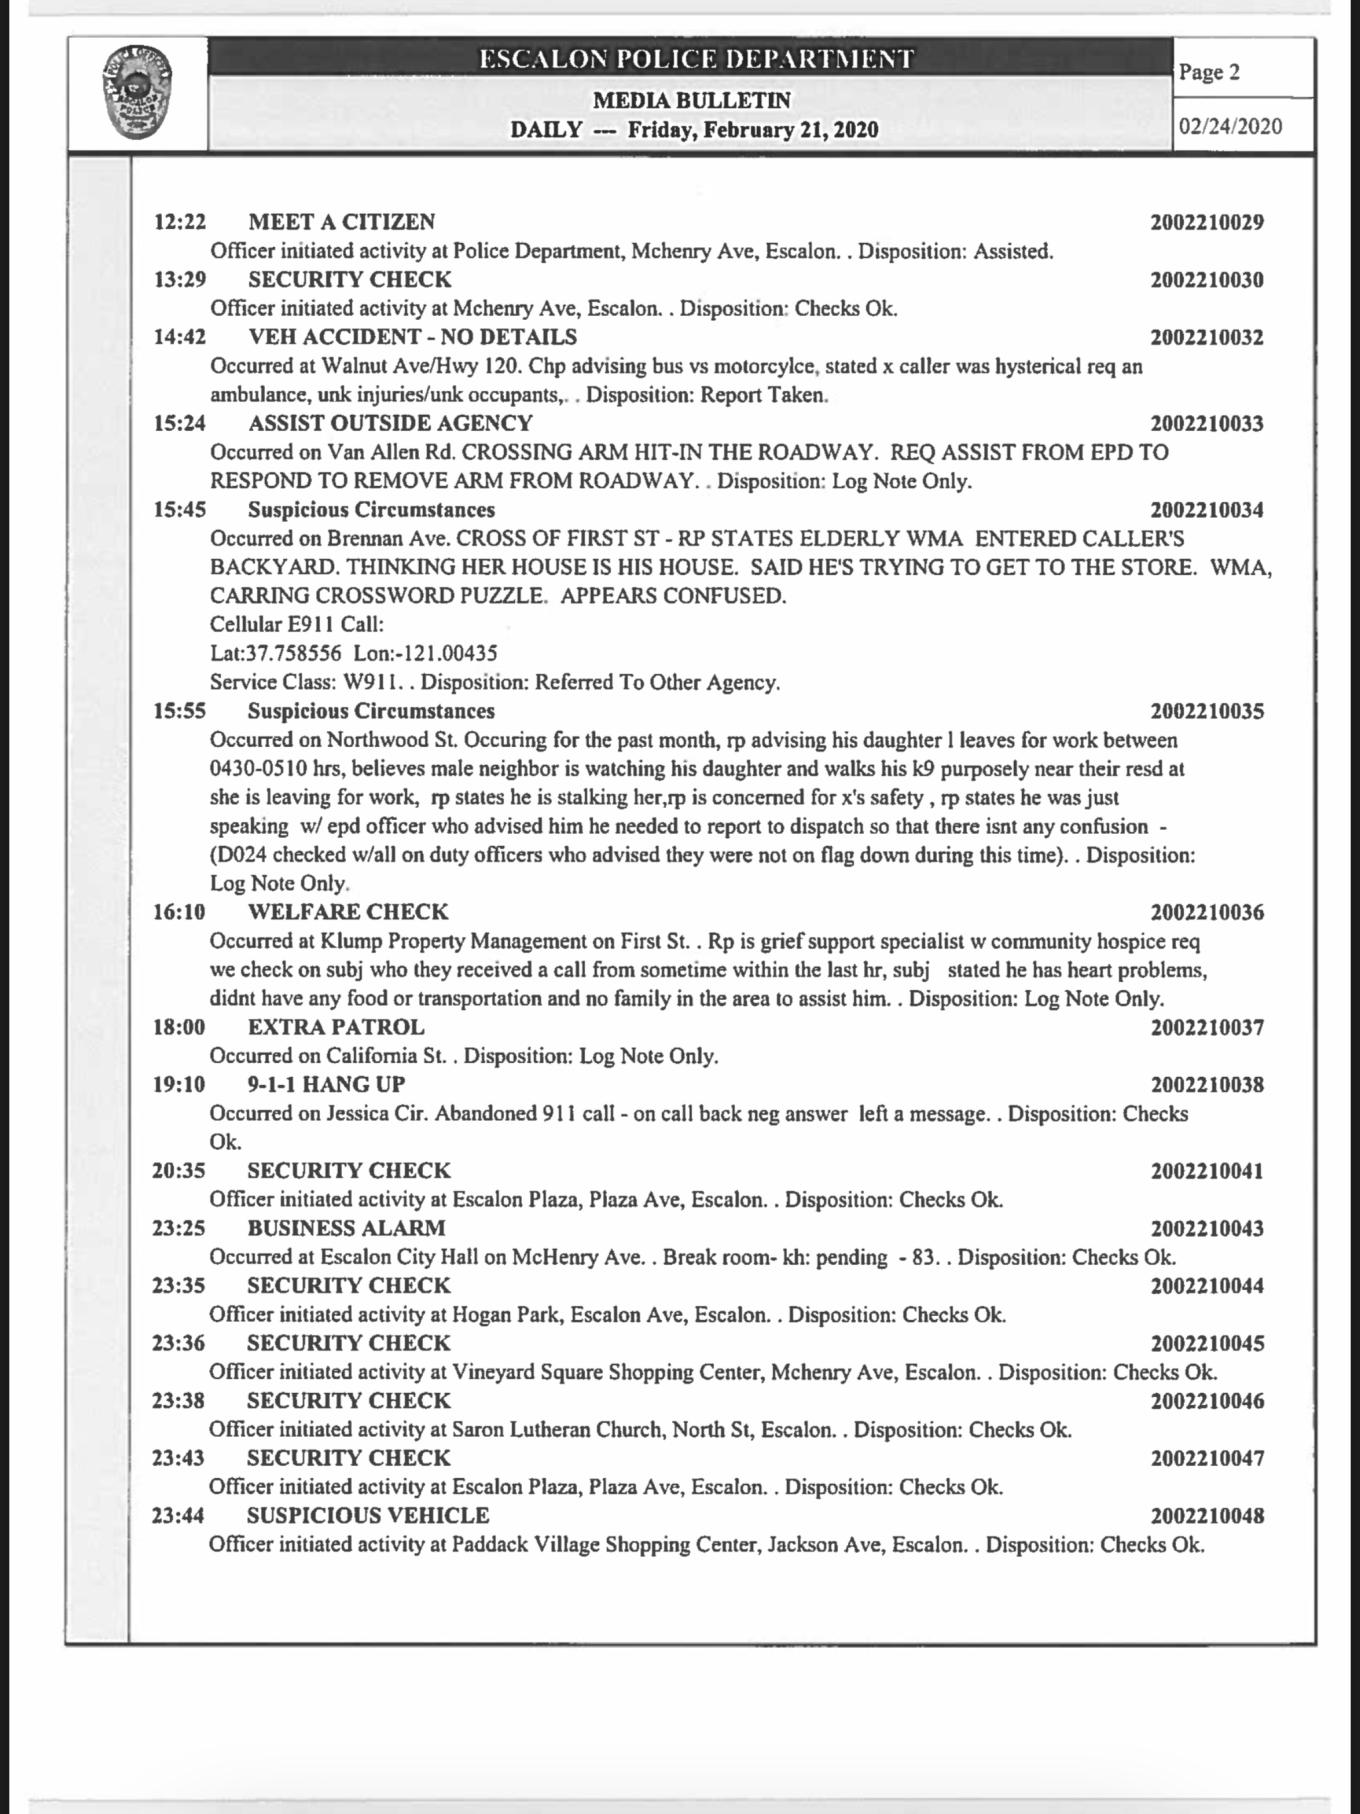 9E199CAD-A599-4C23-ABAB-70661ECF5DC3